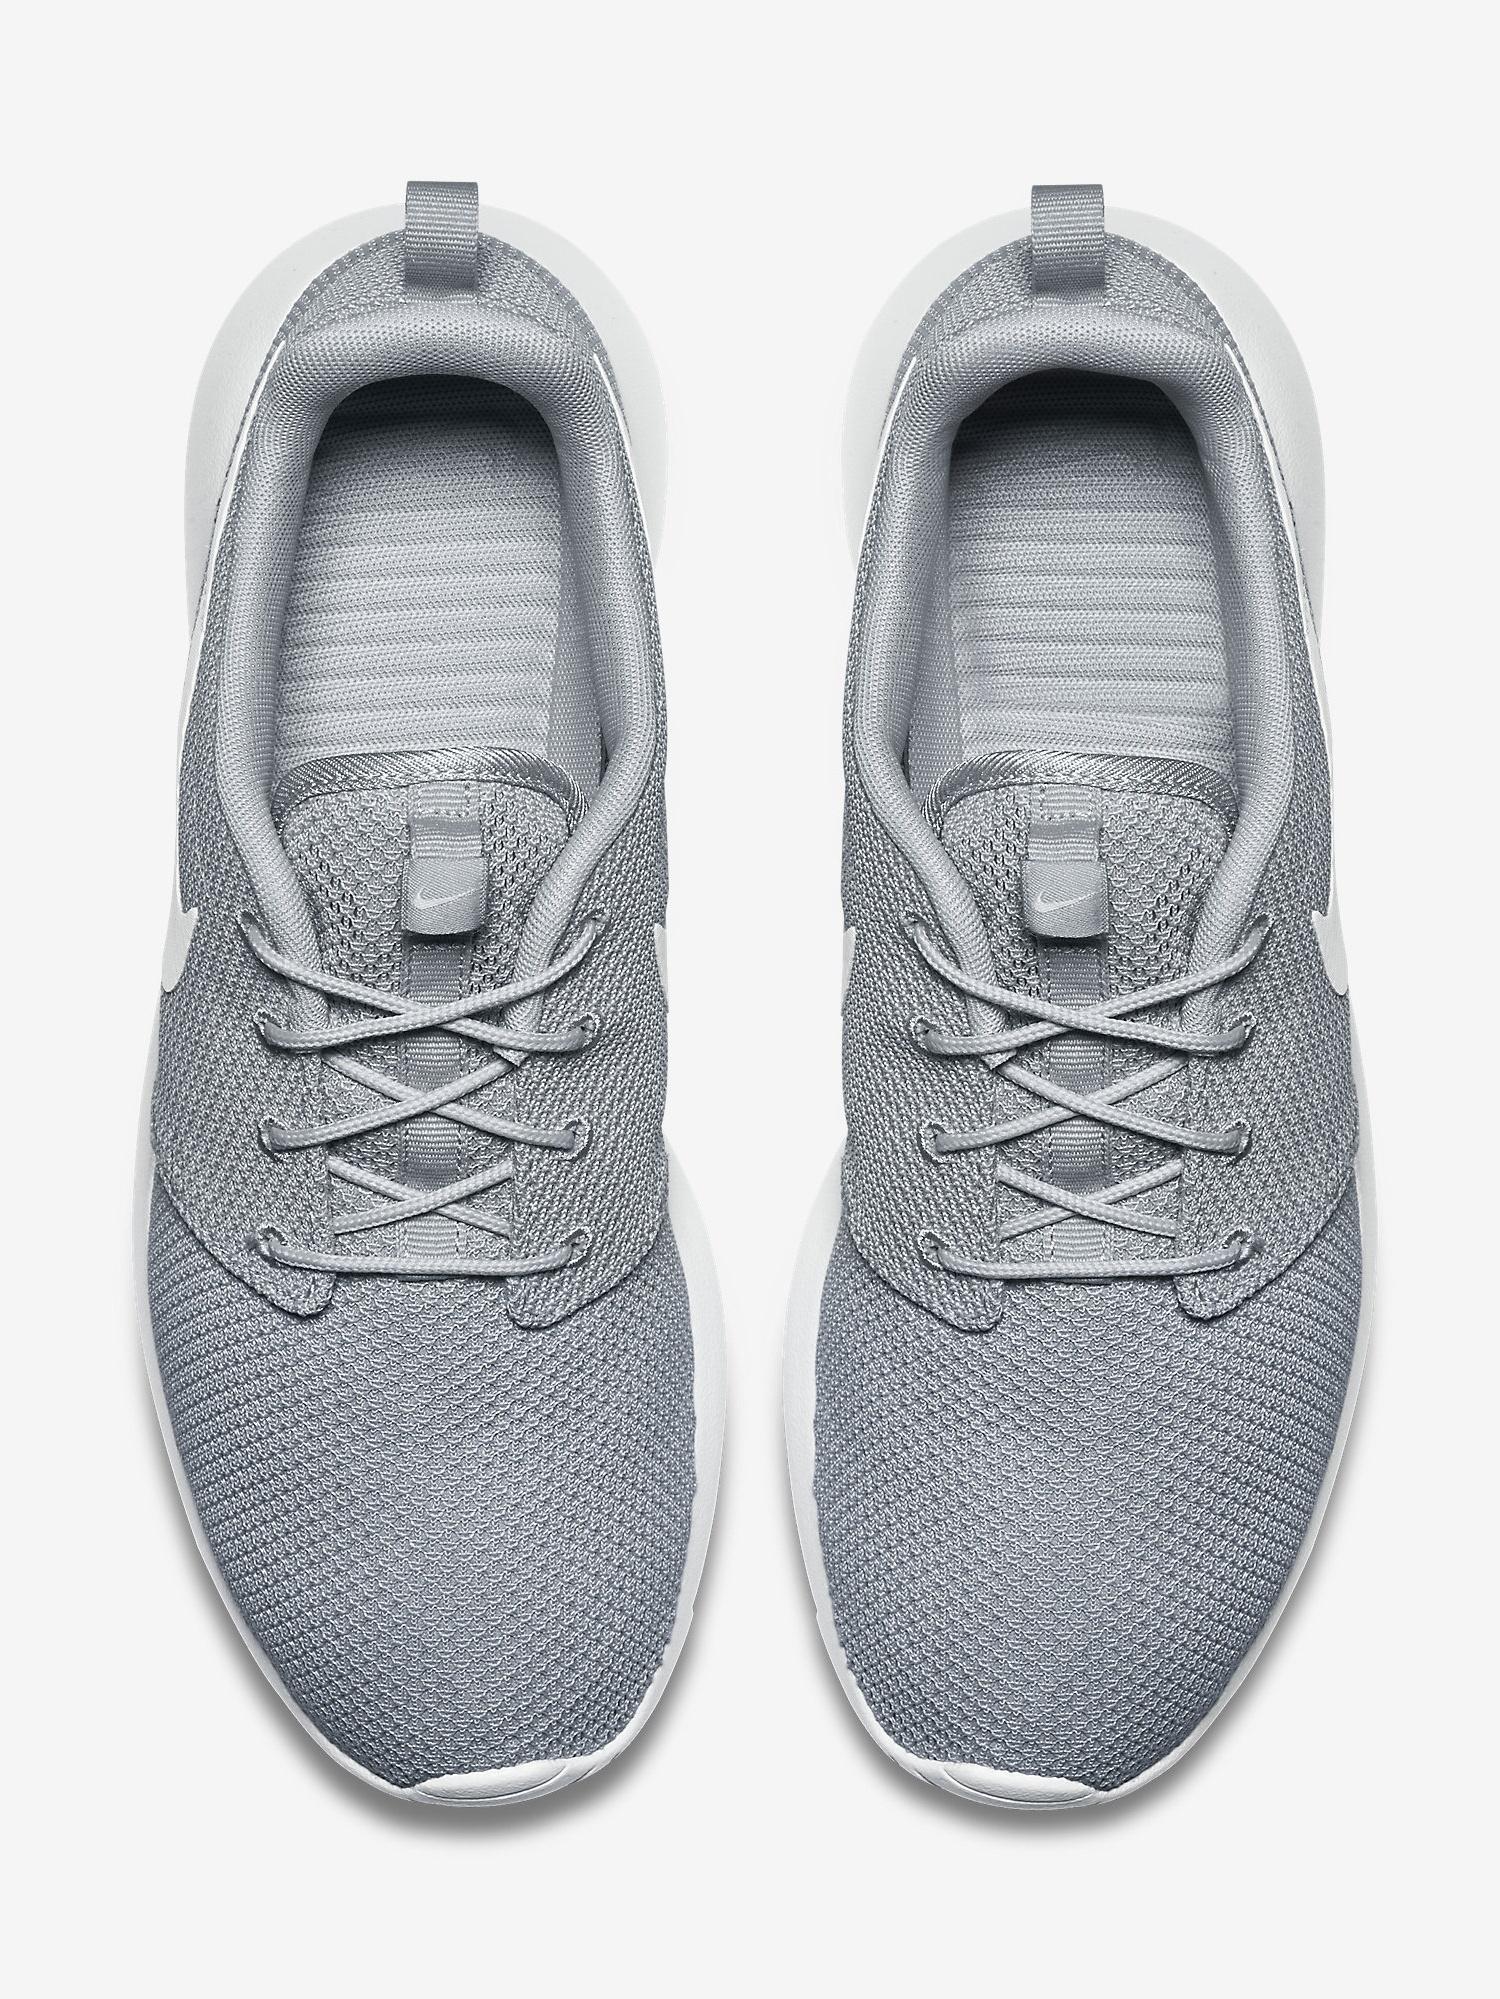 Nike Mens Rosherun (7.5) Wolf Grey/White Running Shoe (7.5) Rosherun 6c1fac